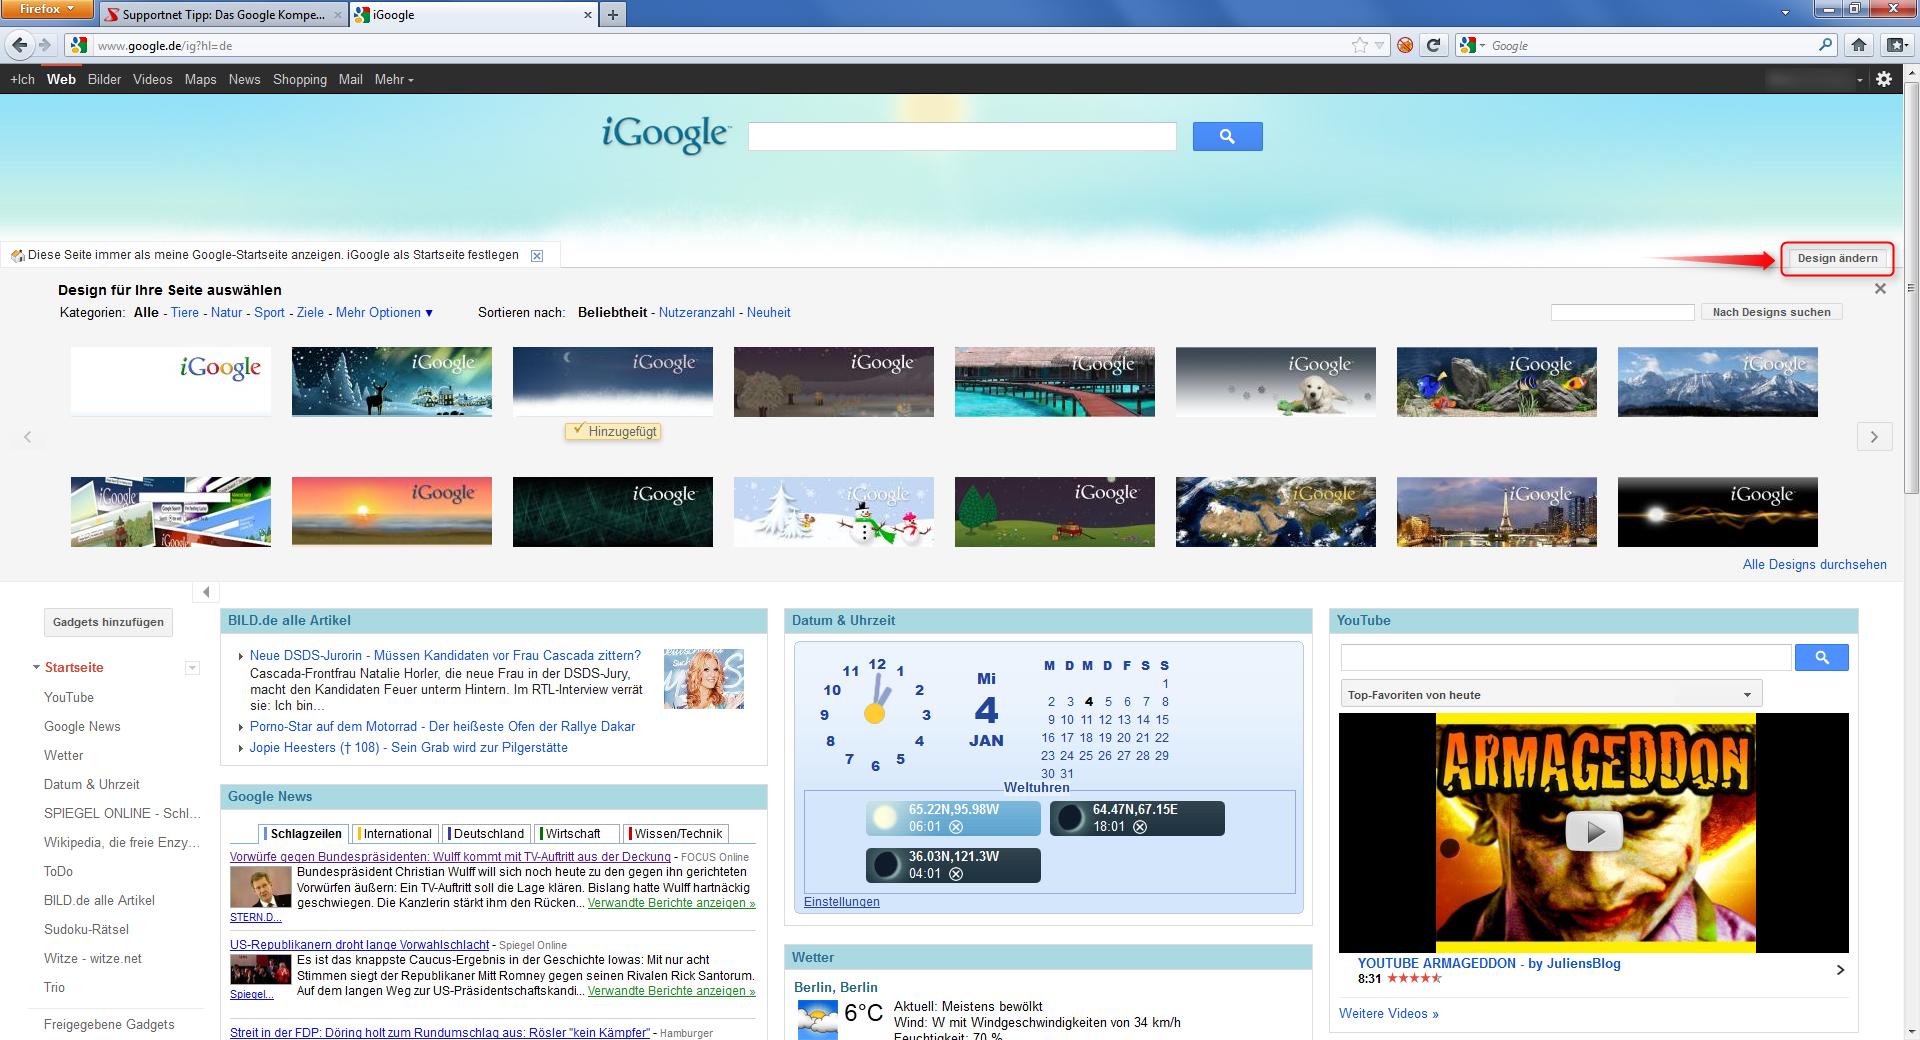 02-igoole-das-persoenliche-google-design-aendern-470.png?nocache=1325754578097